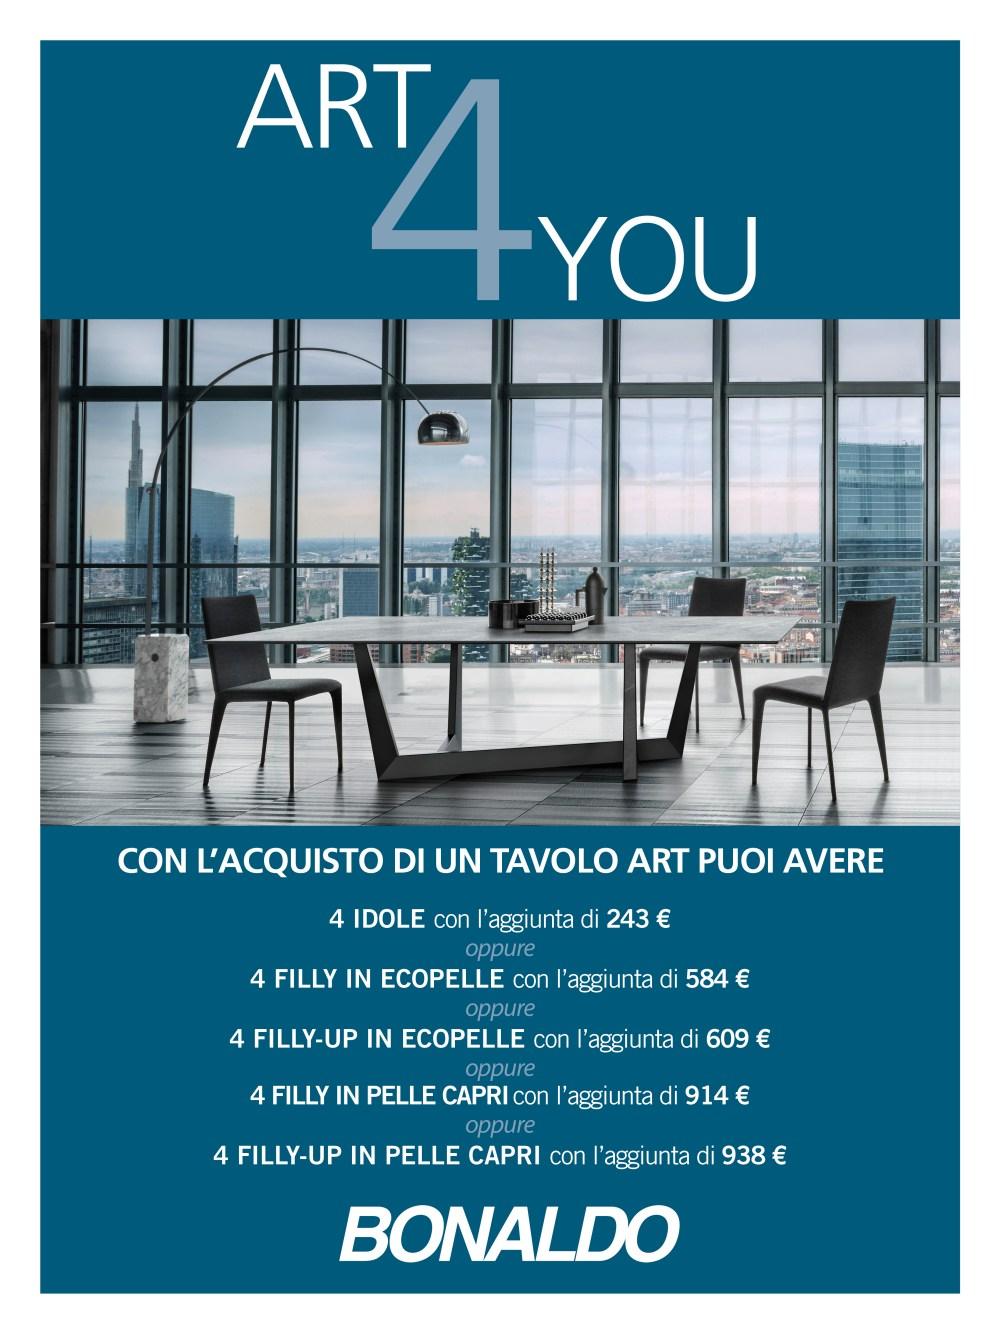 Art4You_cartello da banco_ITA_fronte